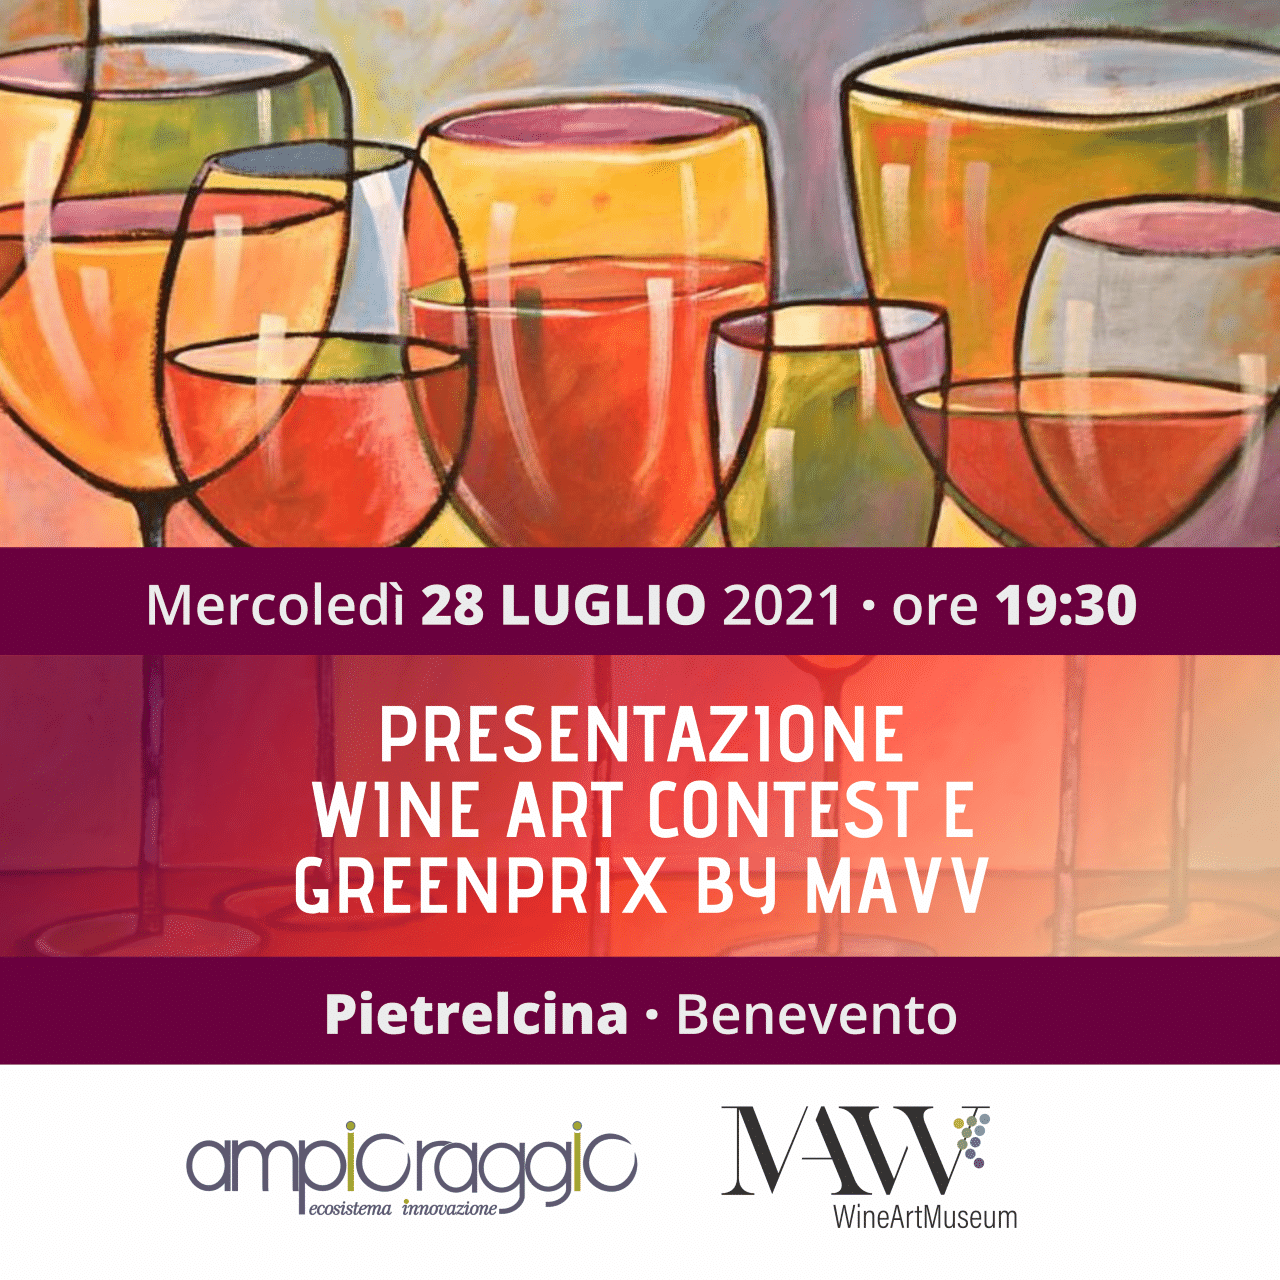 thumbnail_Locandina-Light-Pietrelcina-MAVV-Ampioraggio(28-07-2021)